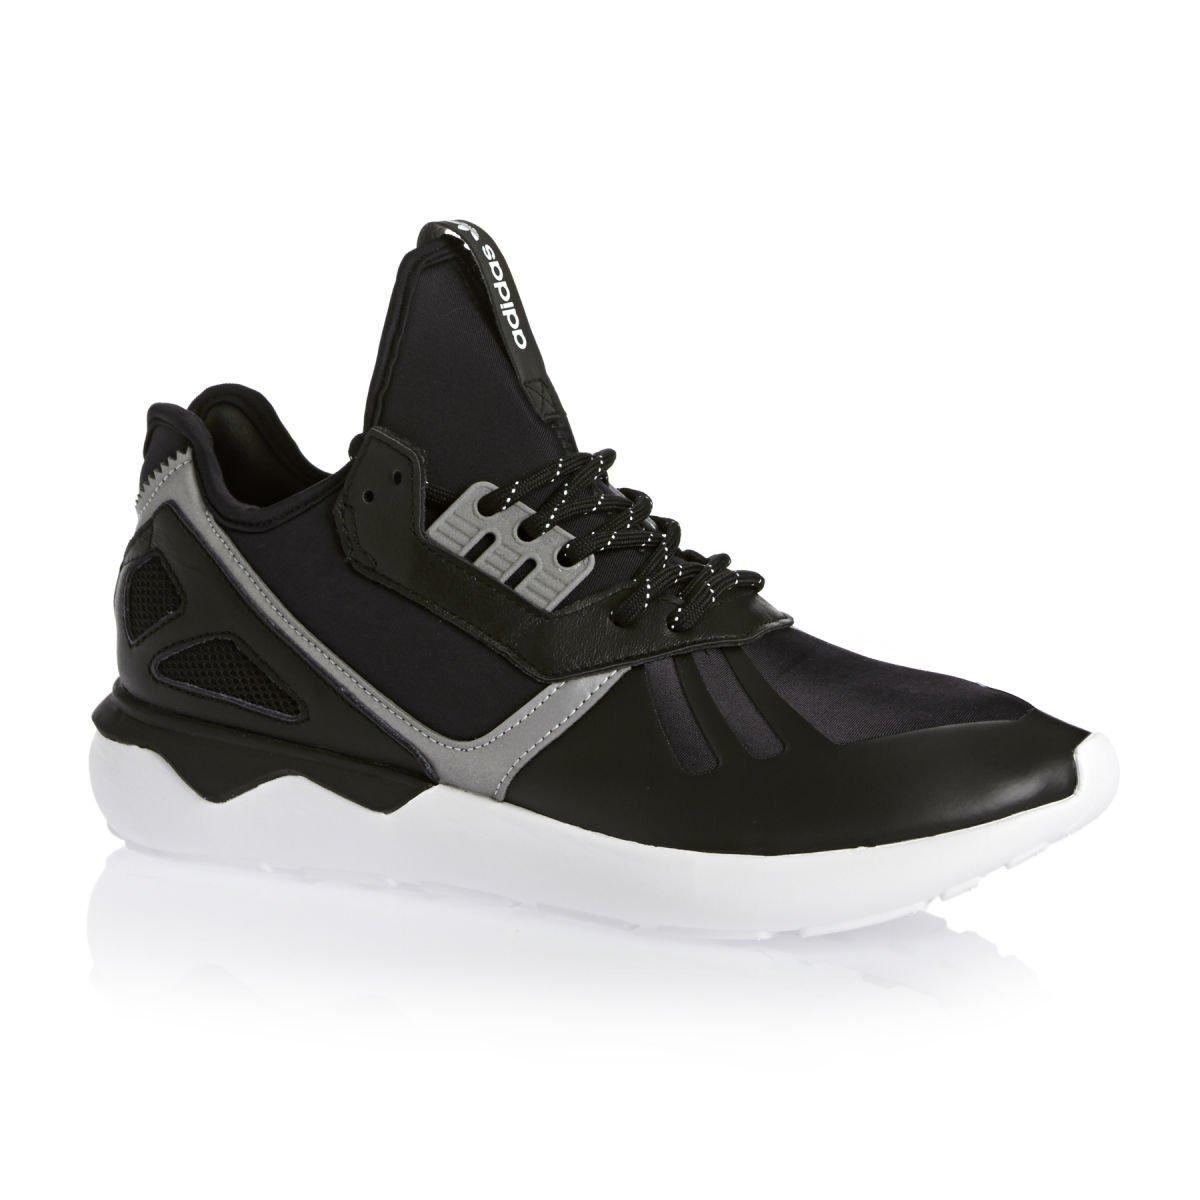 Adidas Unisex-Erwachsene Tubular Runner Gymnastikschuhe, Schwarz, Small